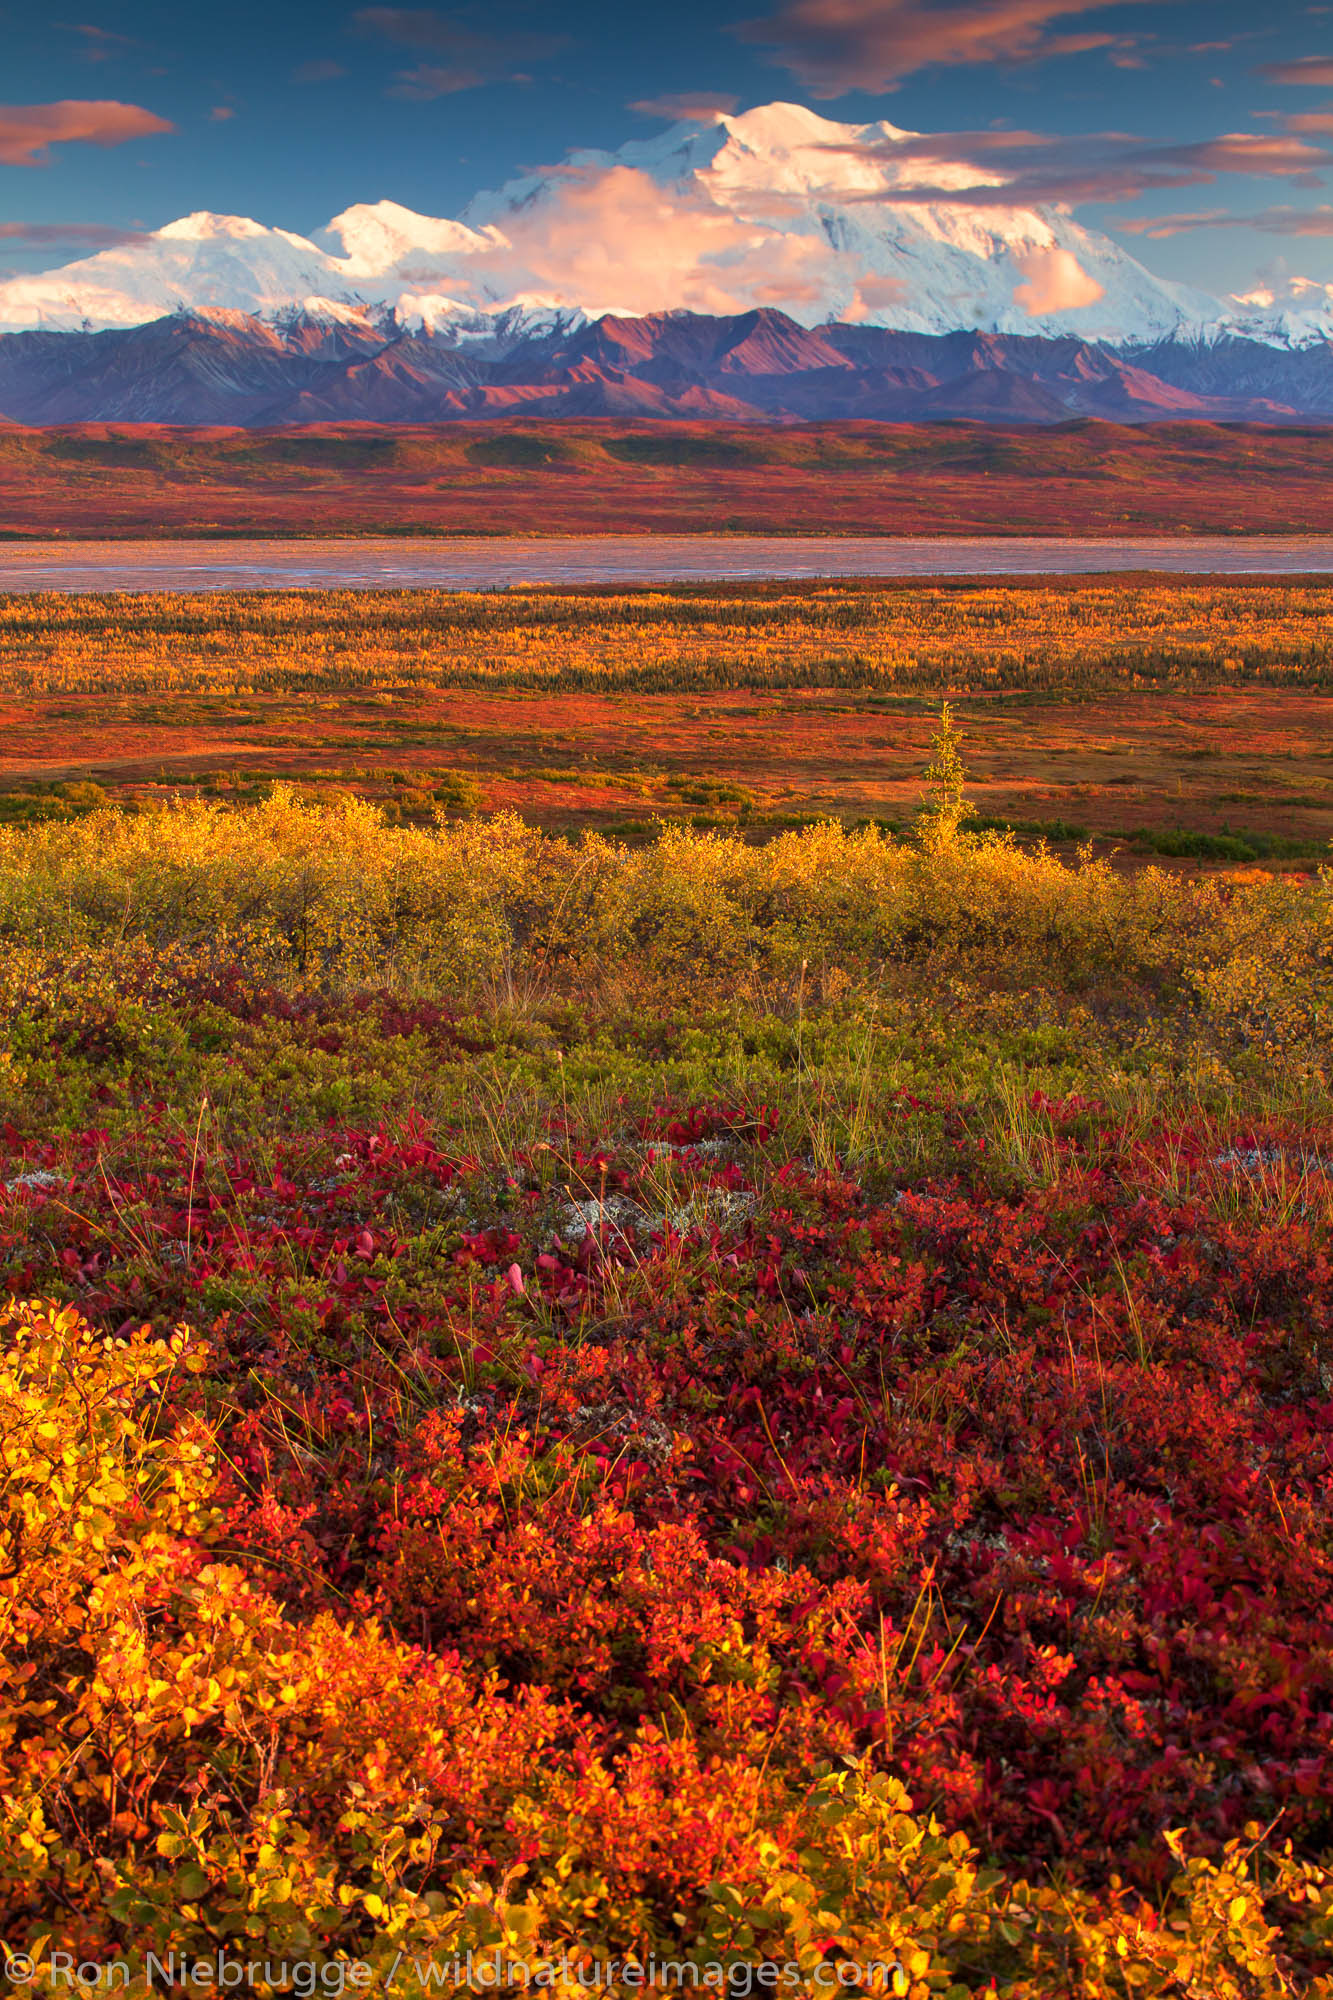 Mt. McKinley or Denali, Denali National Park, Alaska.